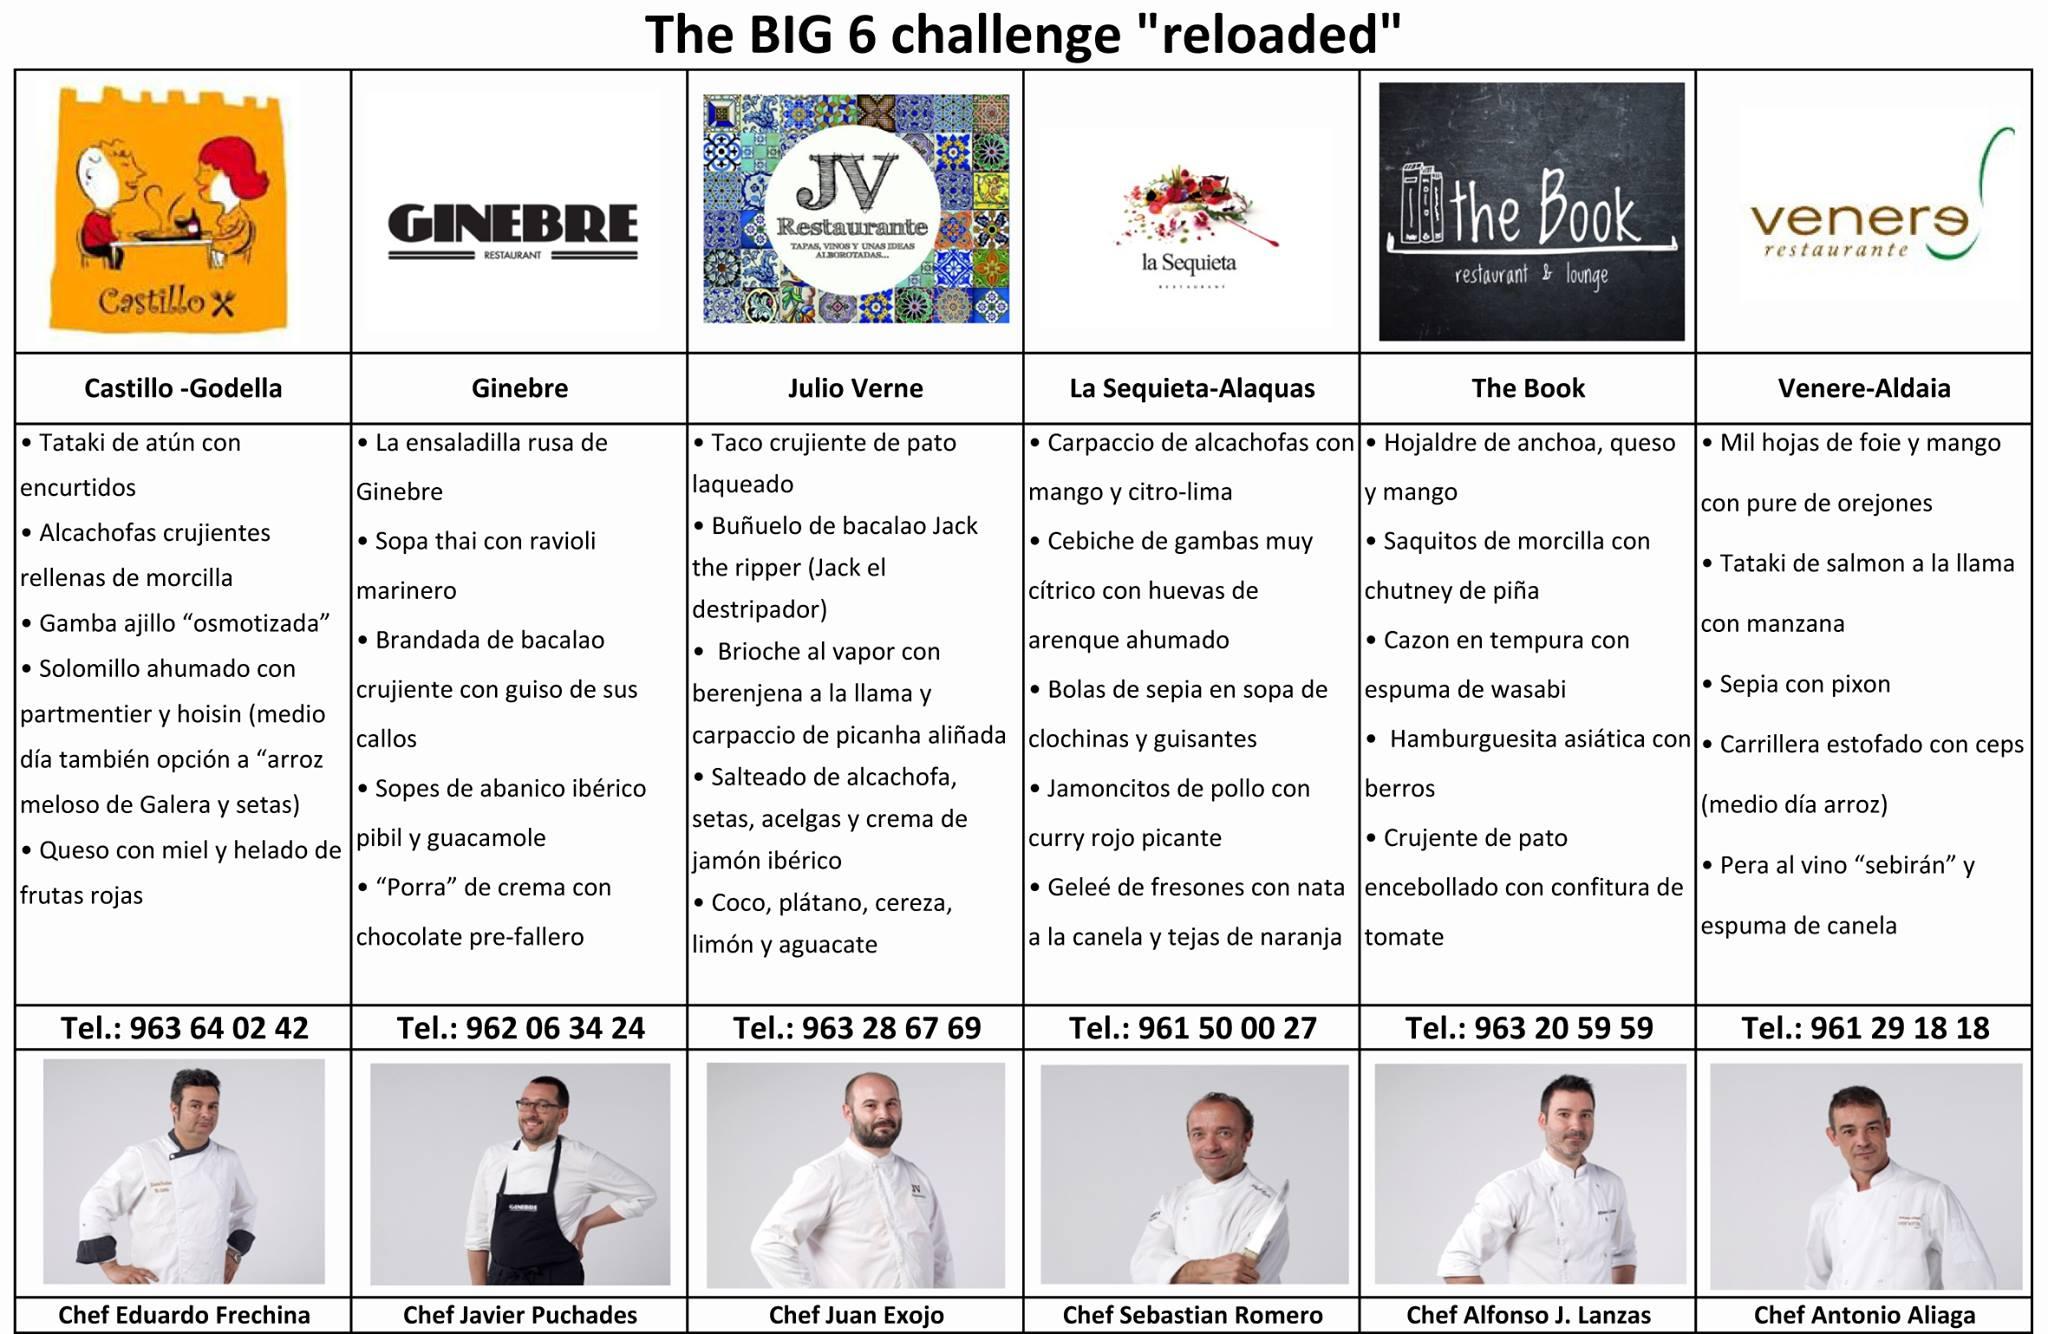 The Big 6 Challenge